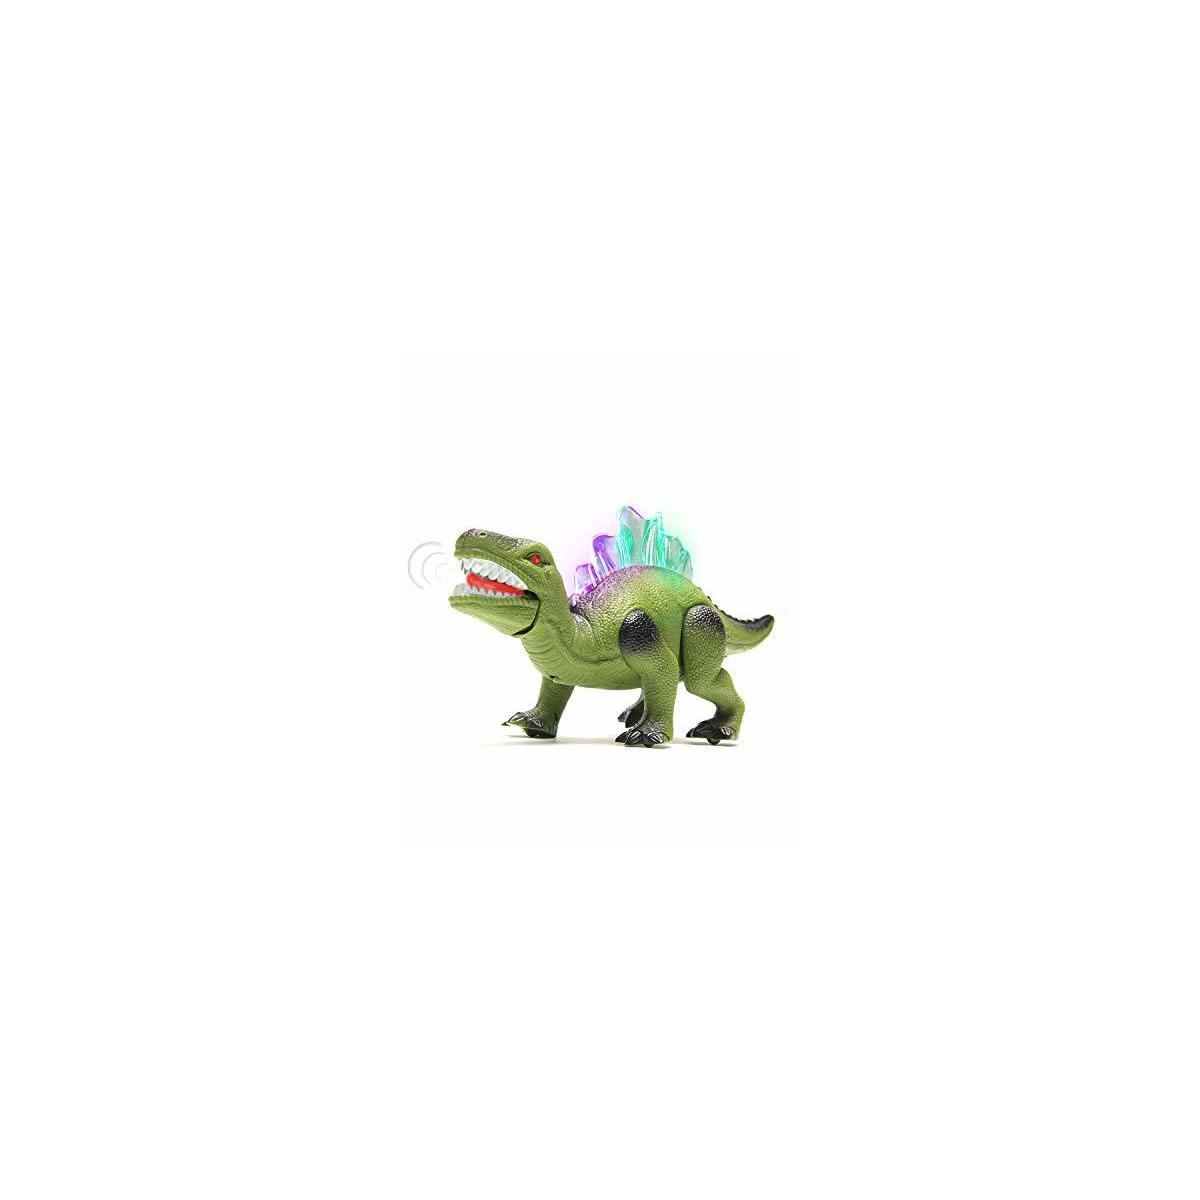 Walking Dinosaur ToyRobot Dinosaur Toy Walks Mouth Moves Roars and Lights